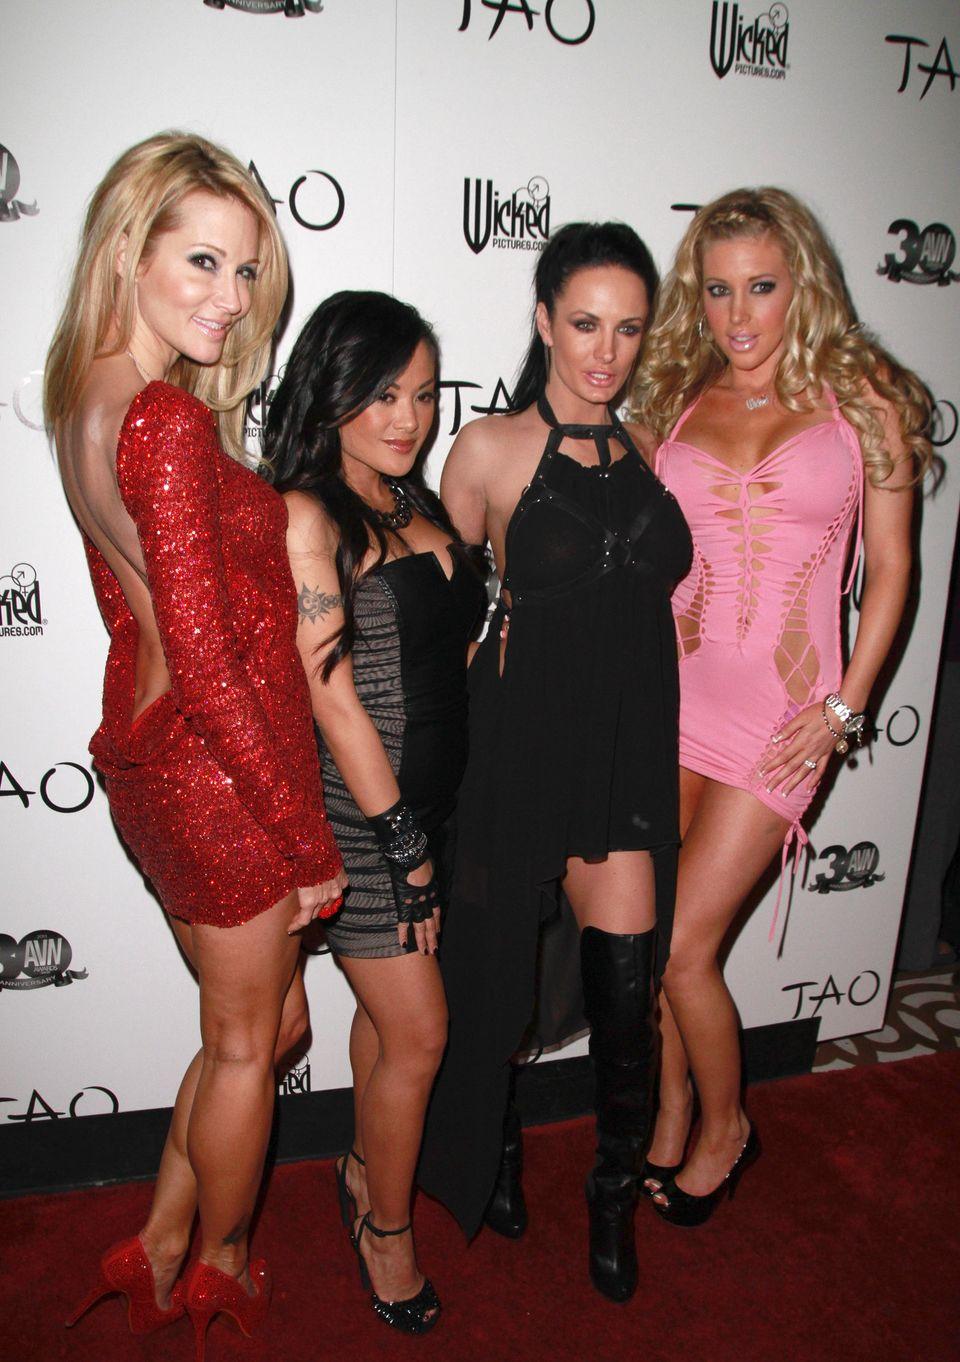 Avn Awards Pre-Party Brings Showcases Porn Stars Fashion Sense Photos  Huffpost Life-3859